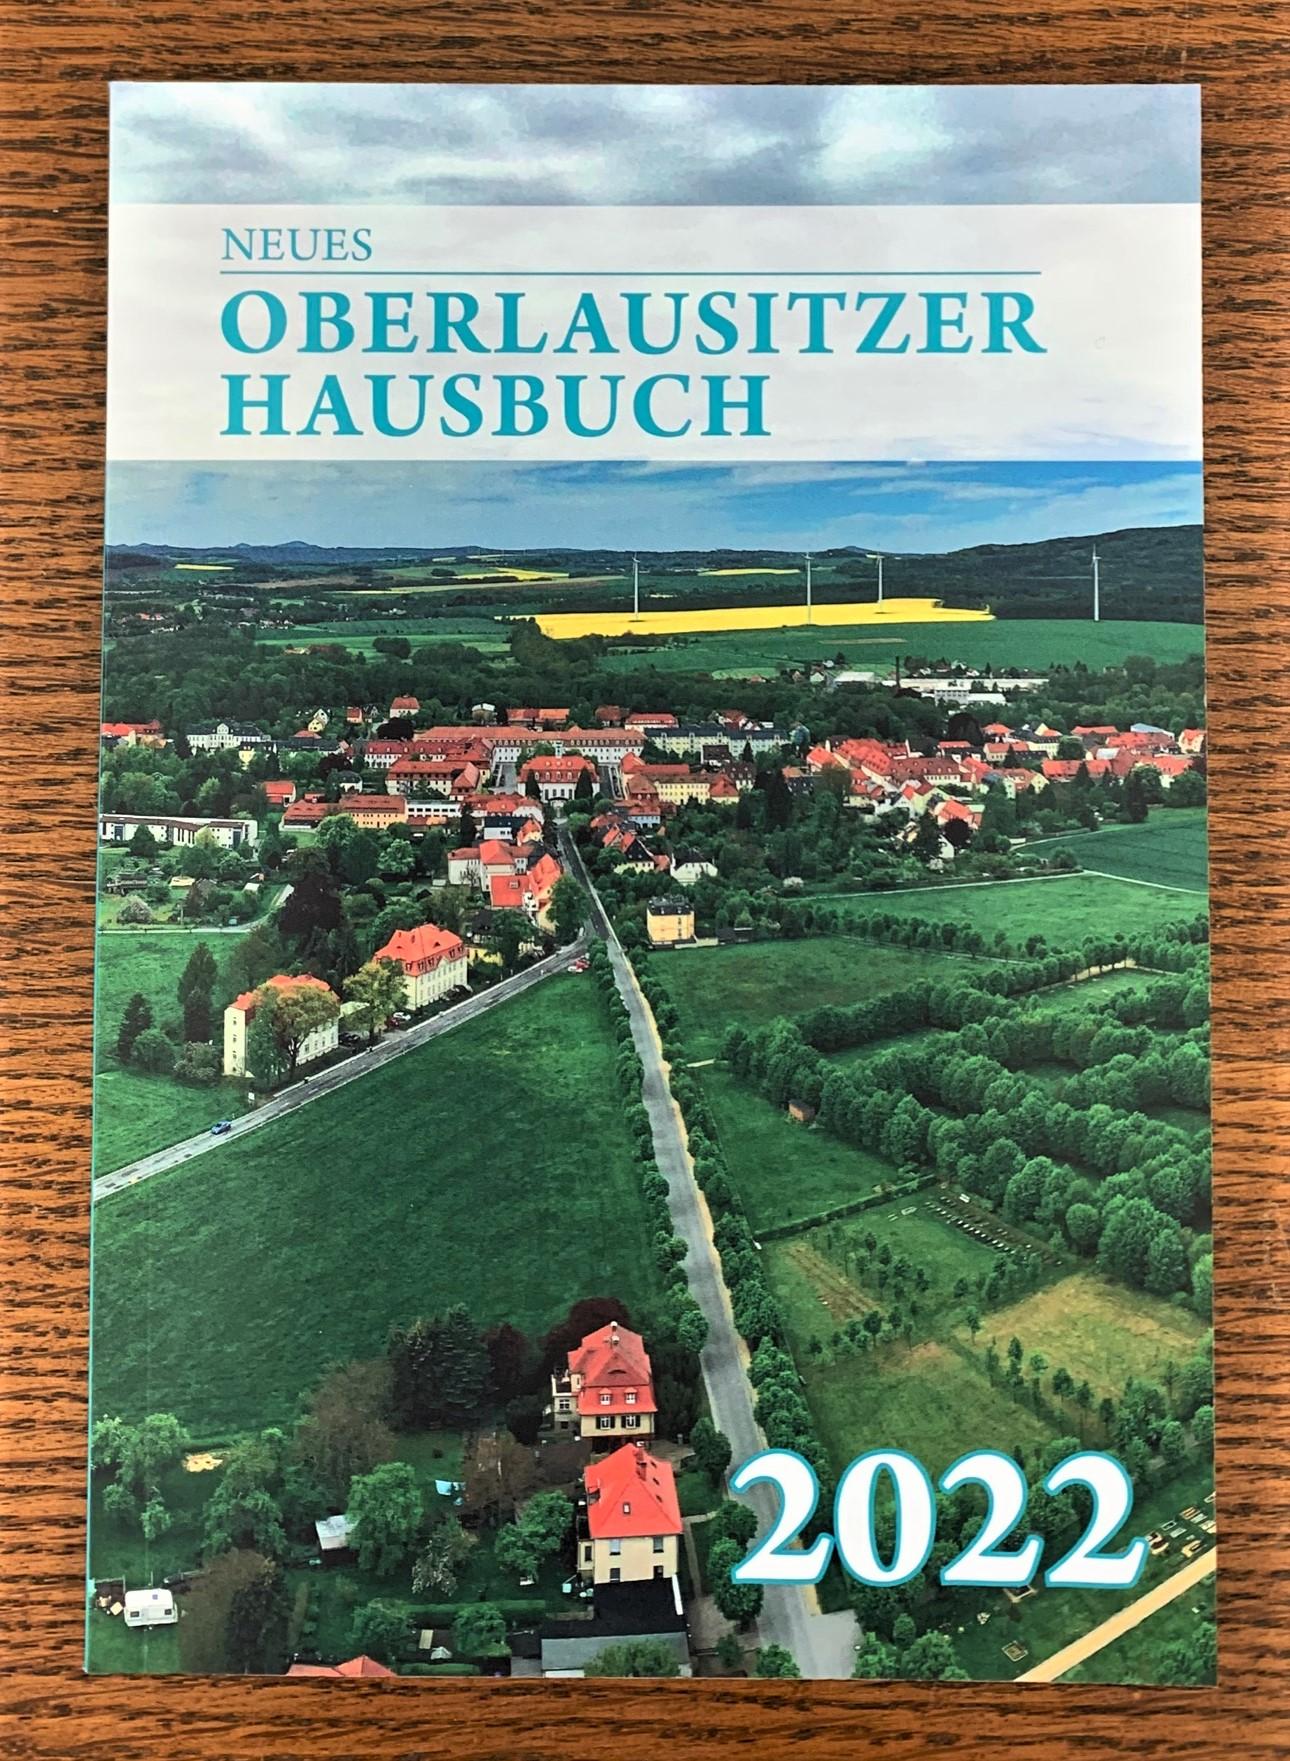 Neues Oberlausitzer Hausbuch 2022 - Cover